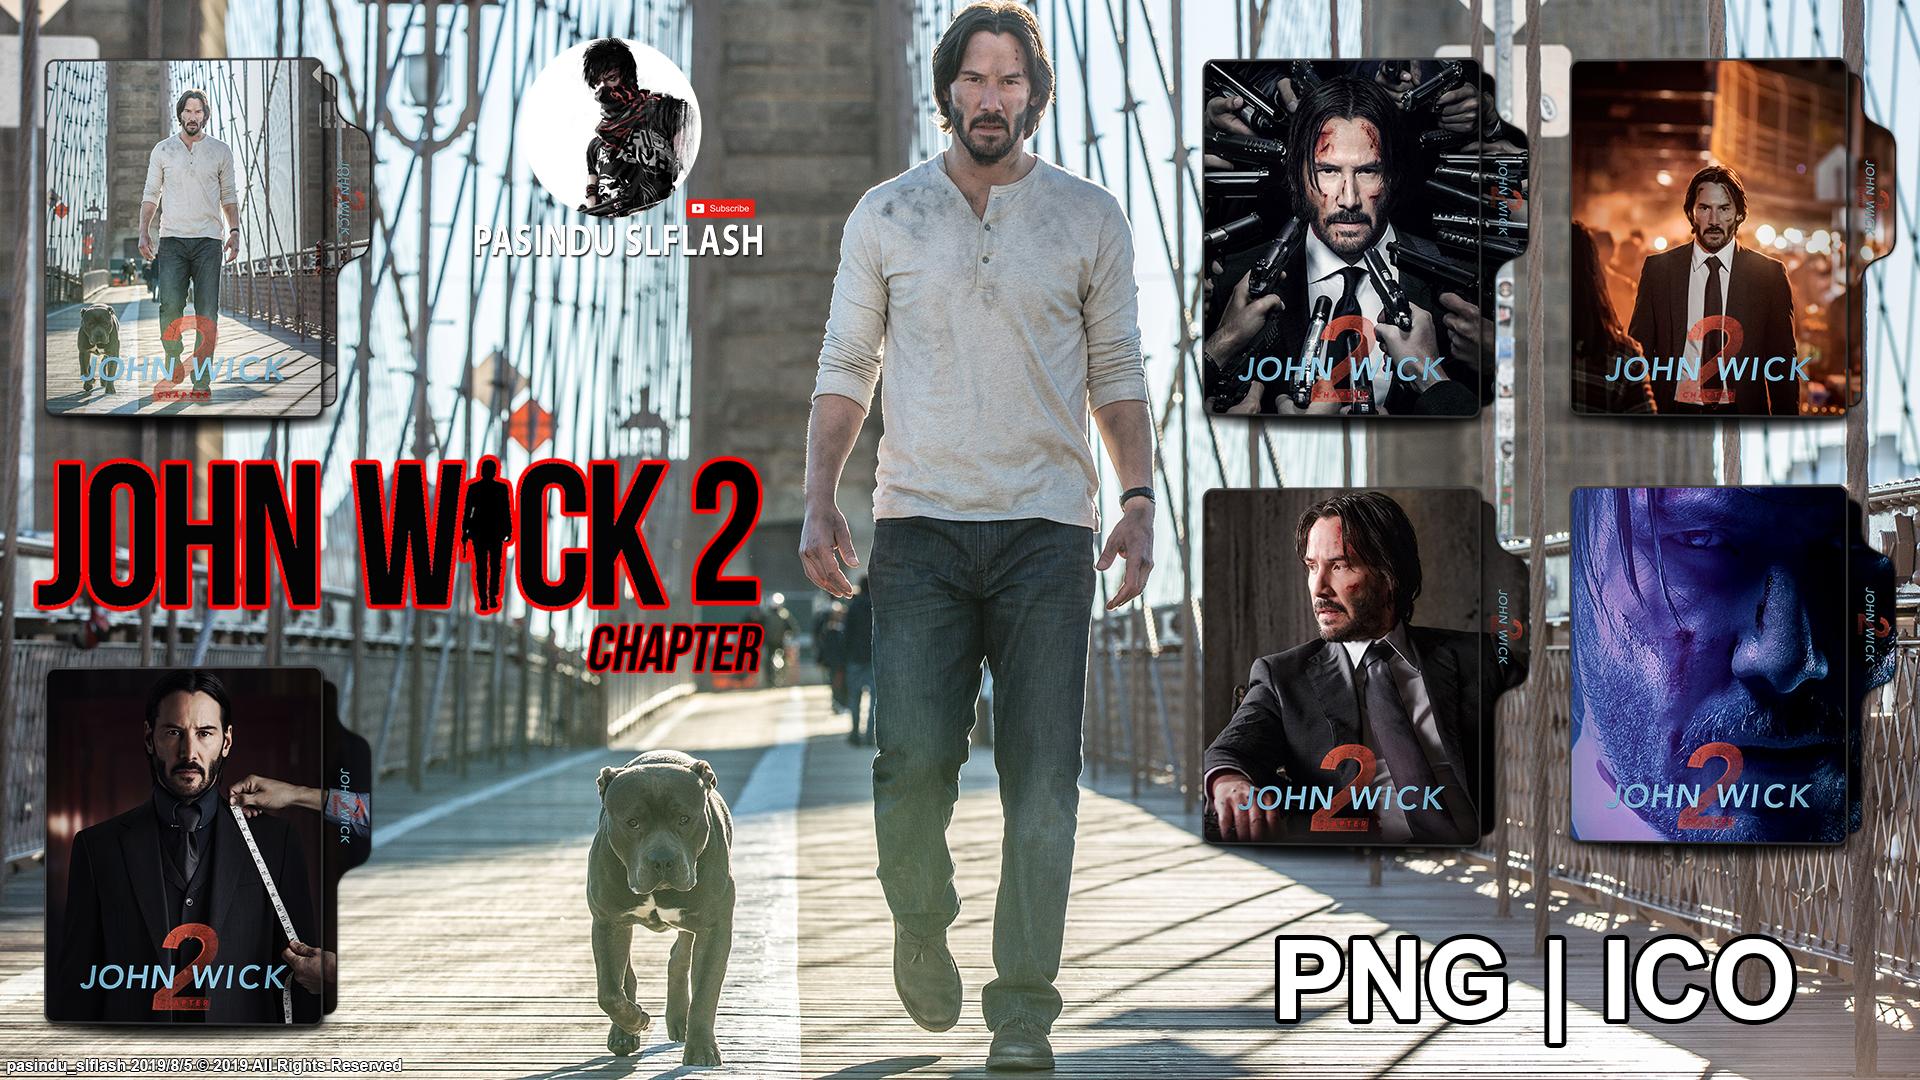 John Wick Chapter 2 2017 Folder Icon Pack By Pasinduslflash On Deviantart